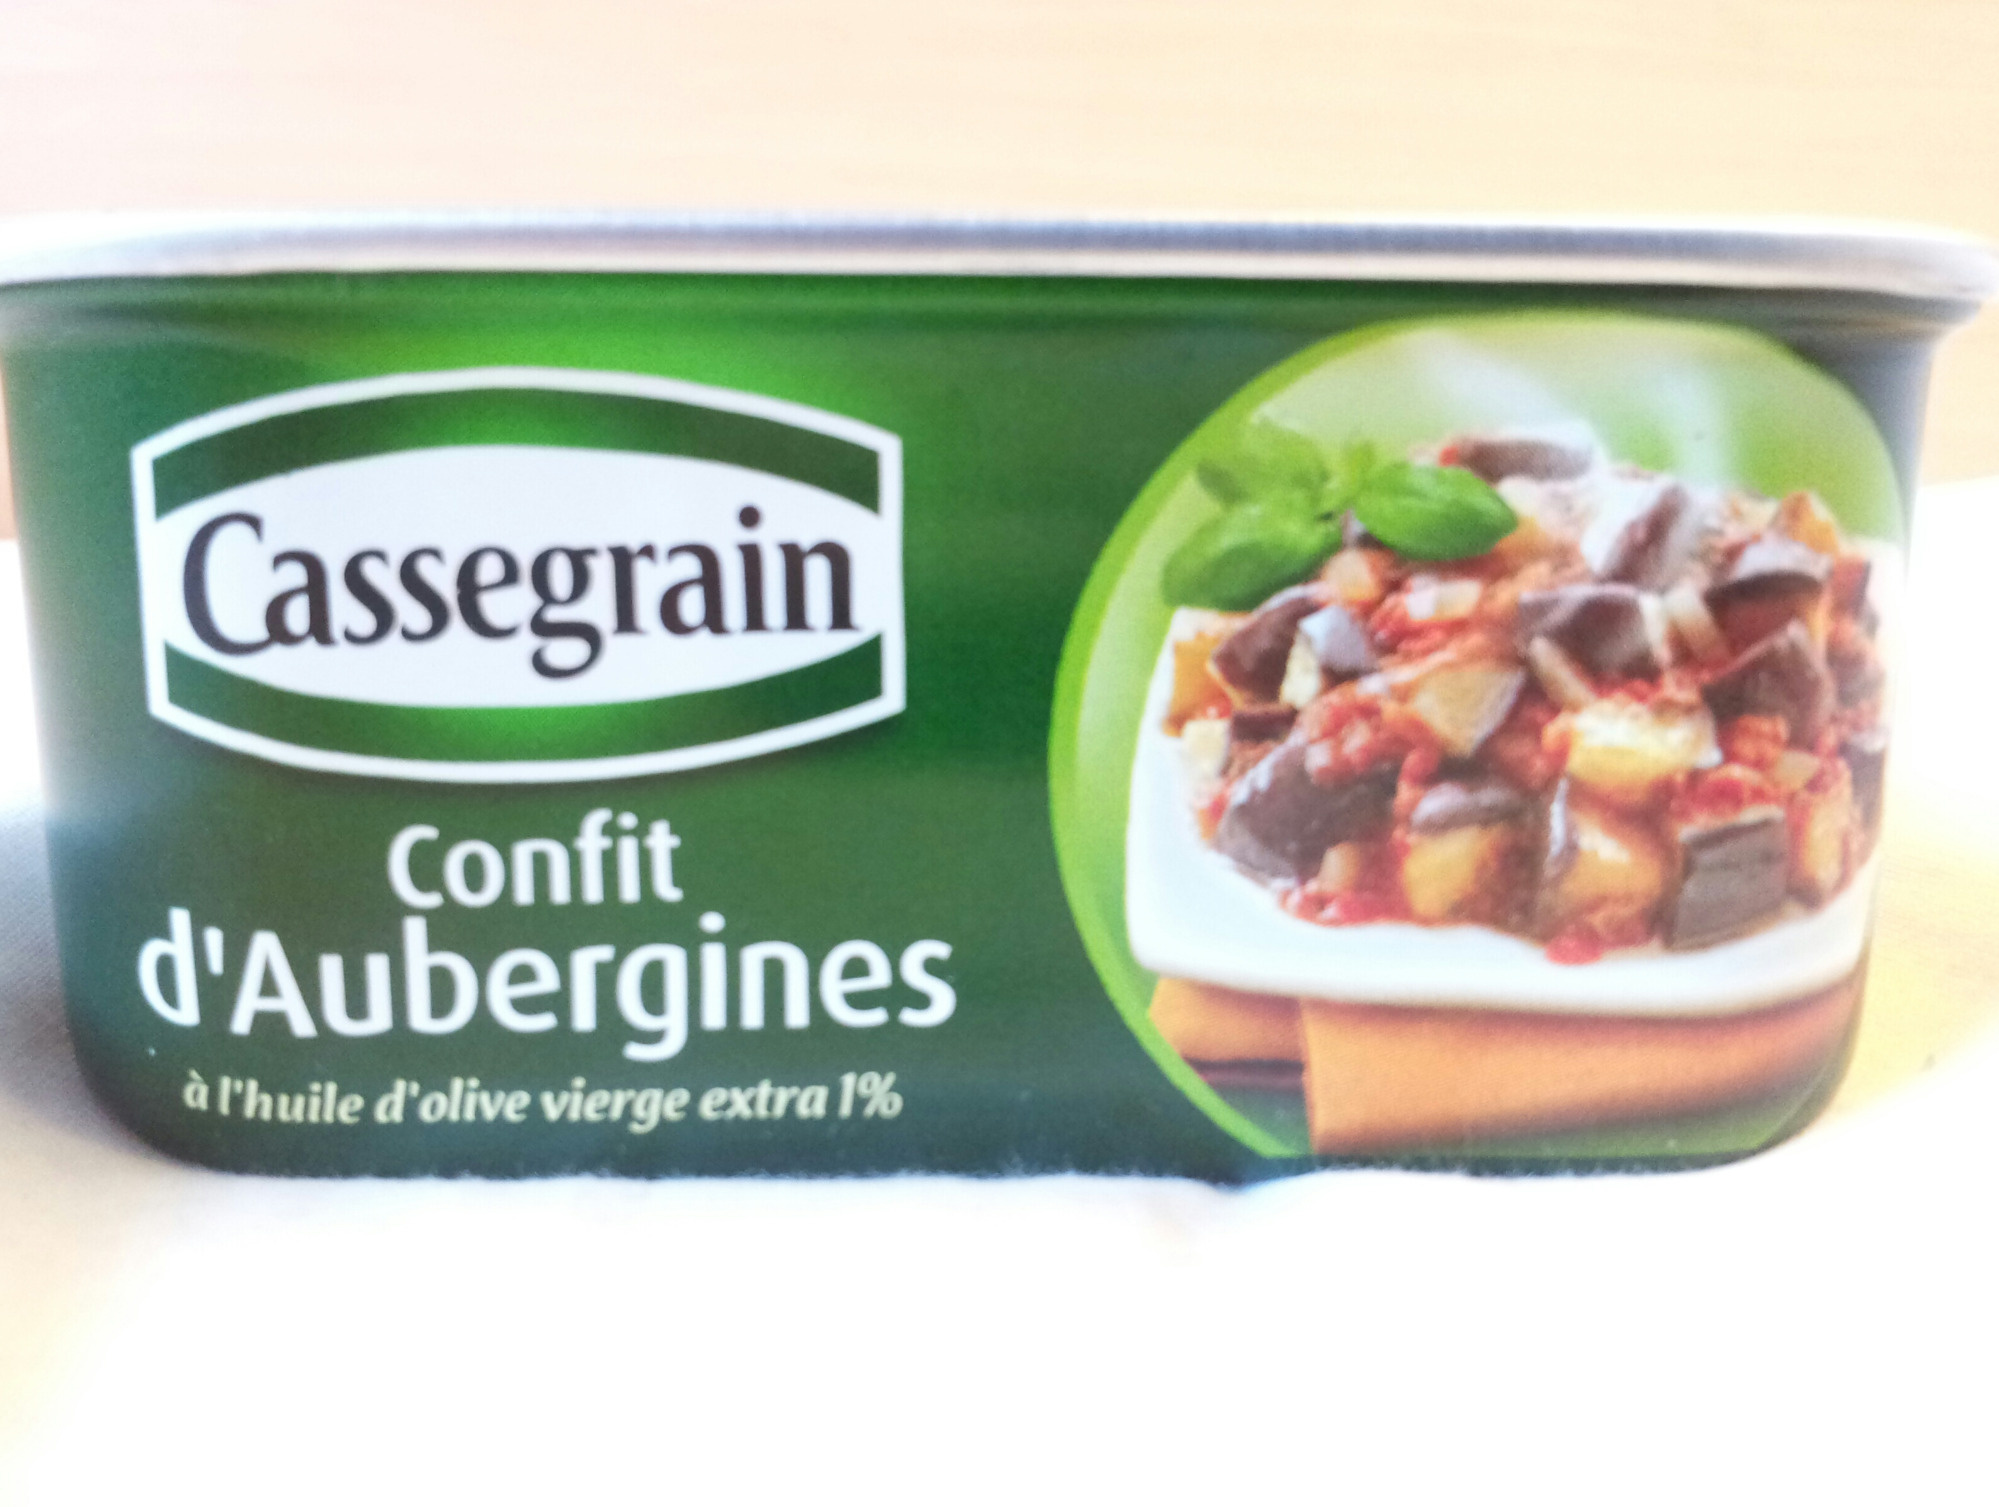 confit d 39 aubergine cassegrain 185g. Black Bedroom Furniture Sets. Home Design Ideas